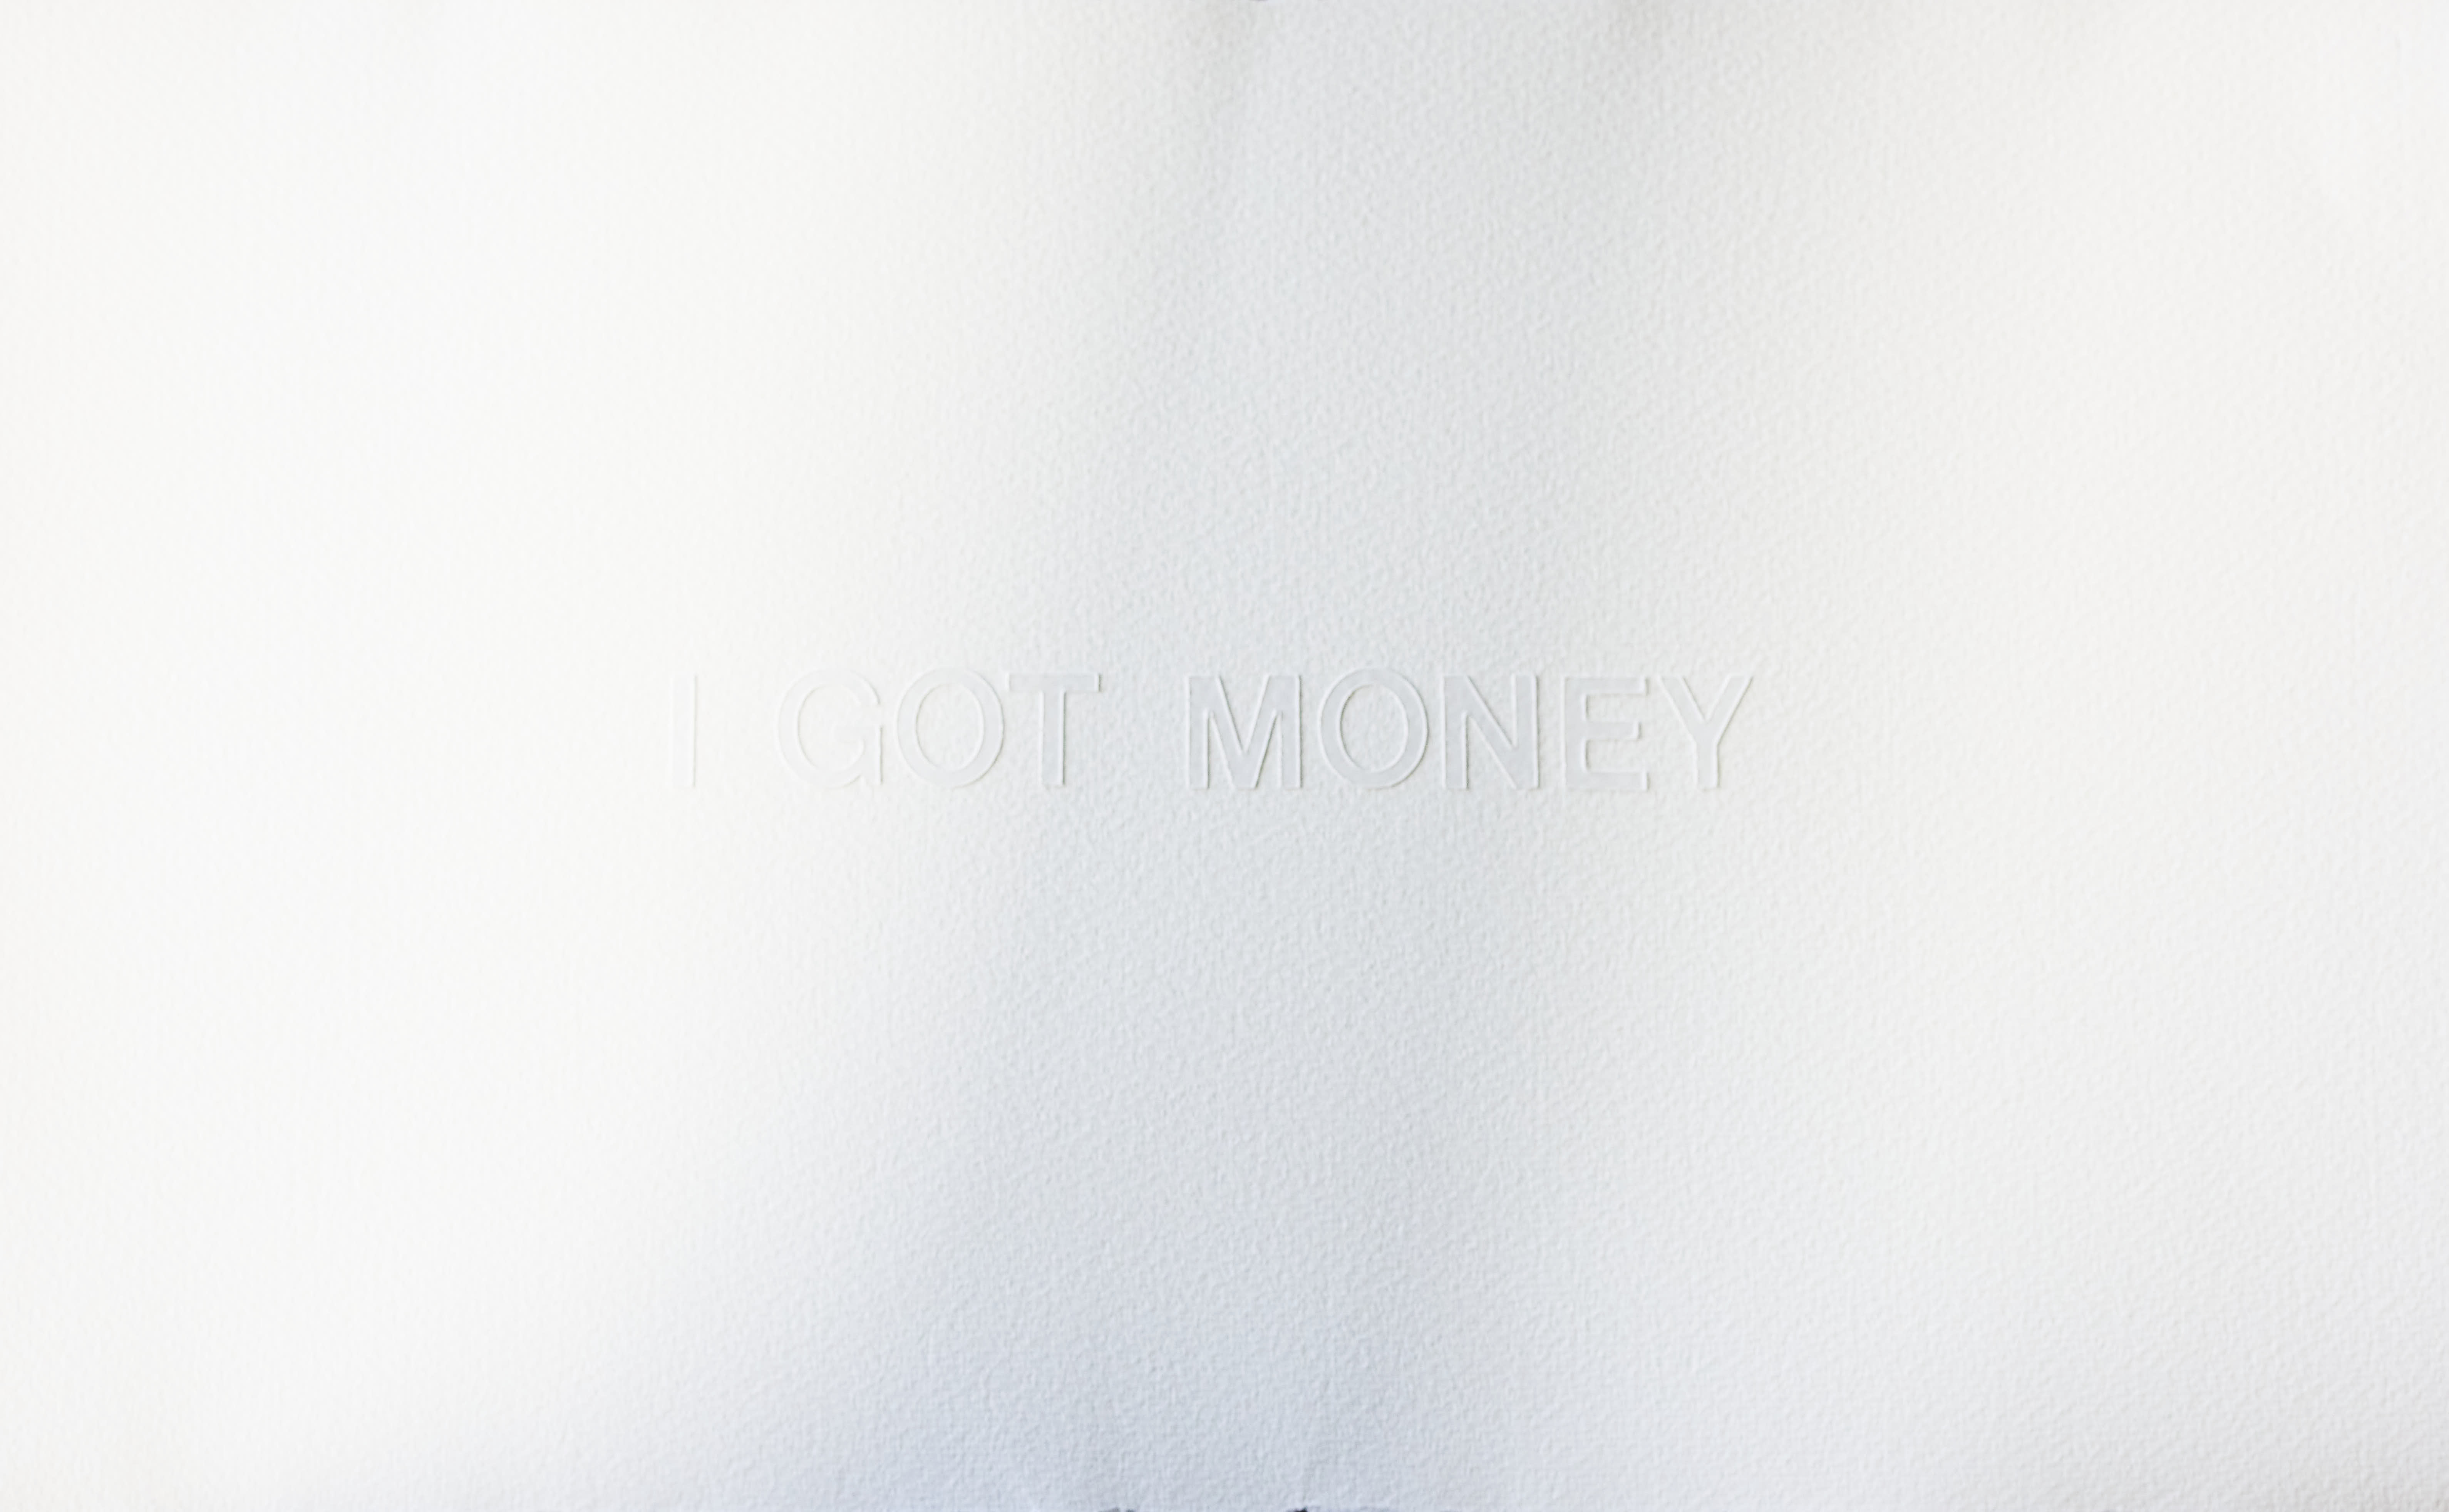 I Got Money, 2020.  Acrylic lettering on Paper, 34 x 56 cm.